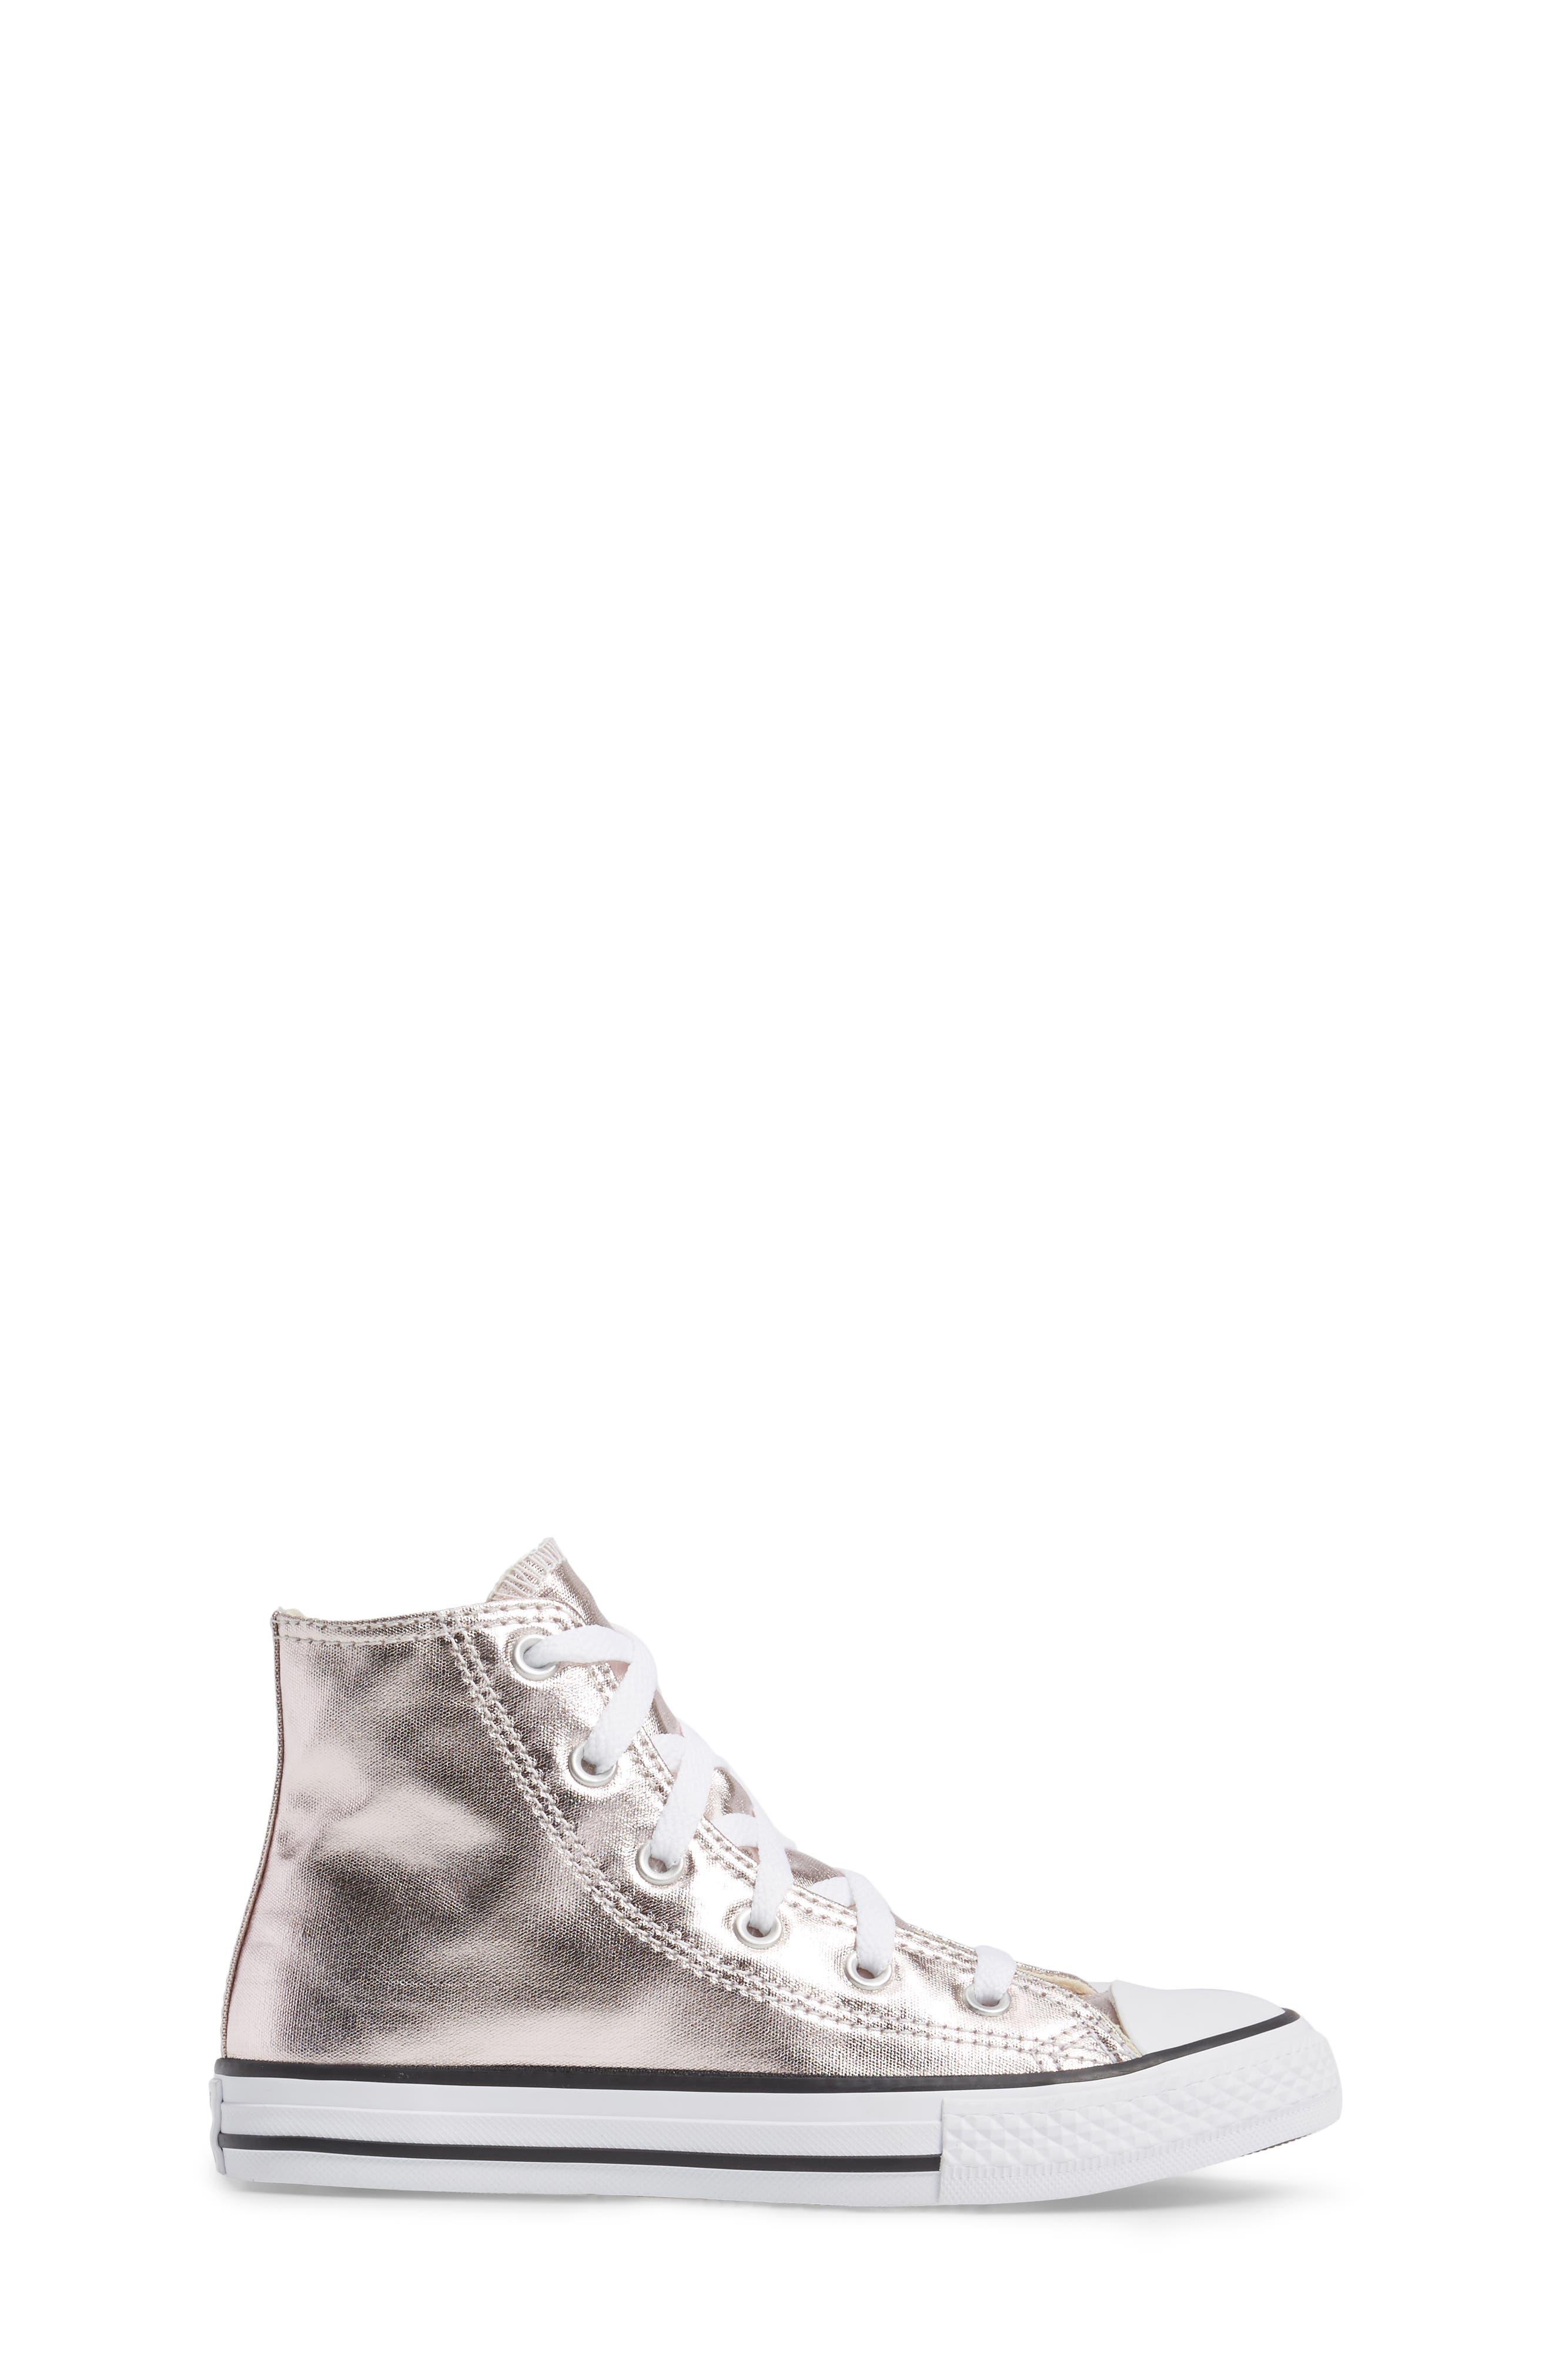 Alternate Image 3  - Converse Chuck Taylor® All Star® Seasonal Metallic High Top Sneaker (Toddler & Little Kid)